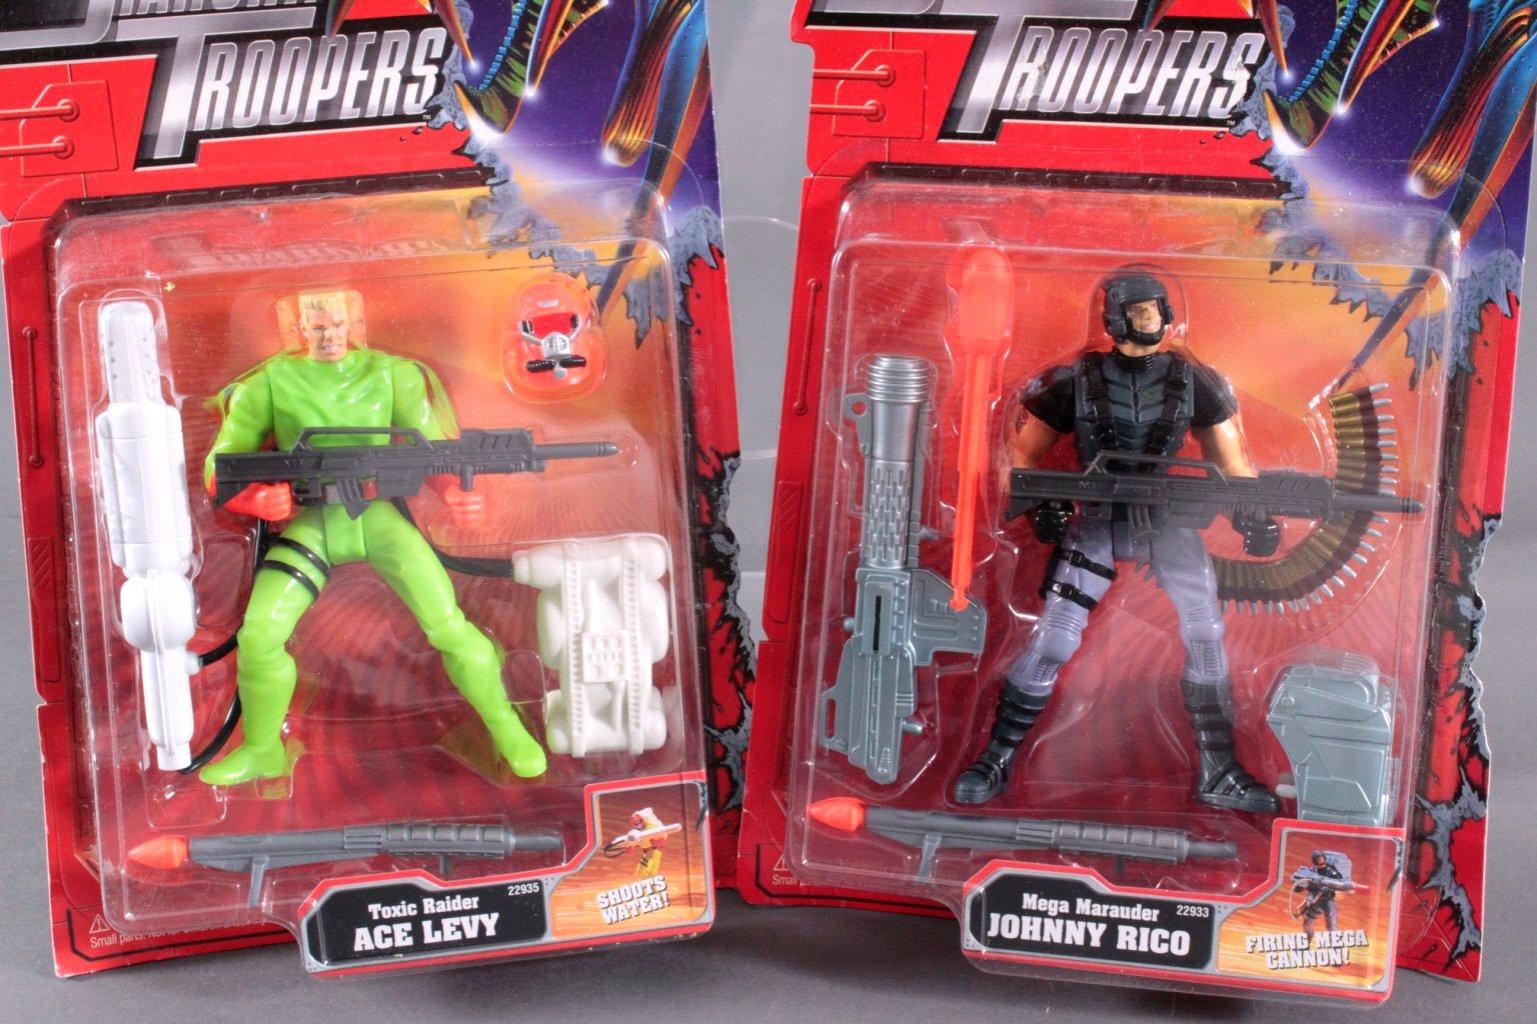 Starship Troopers Action Figuren 4 Stück-2